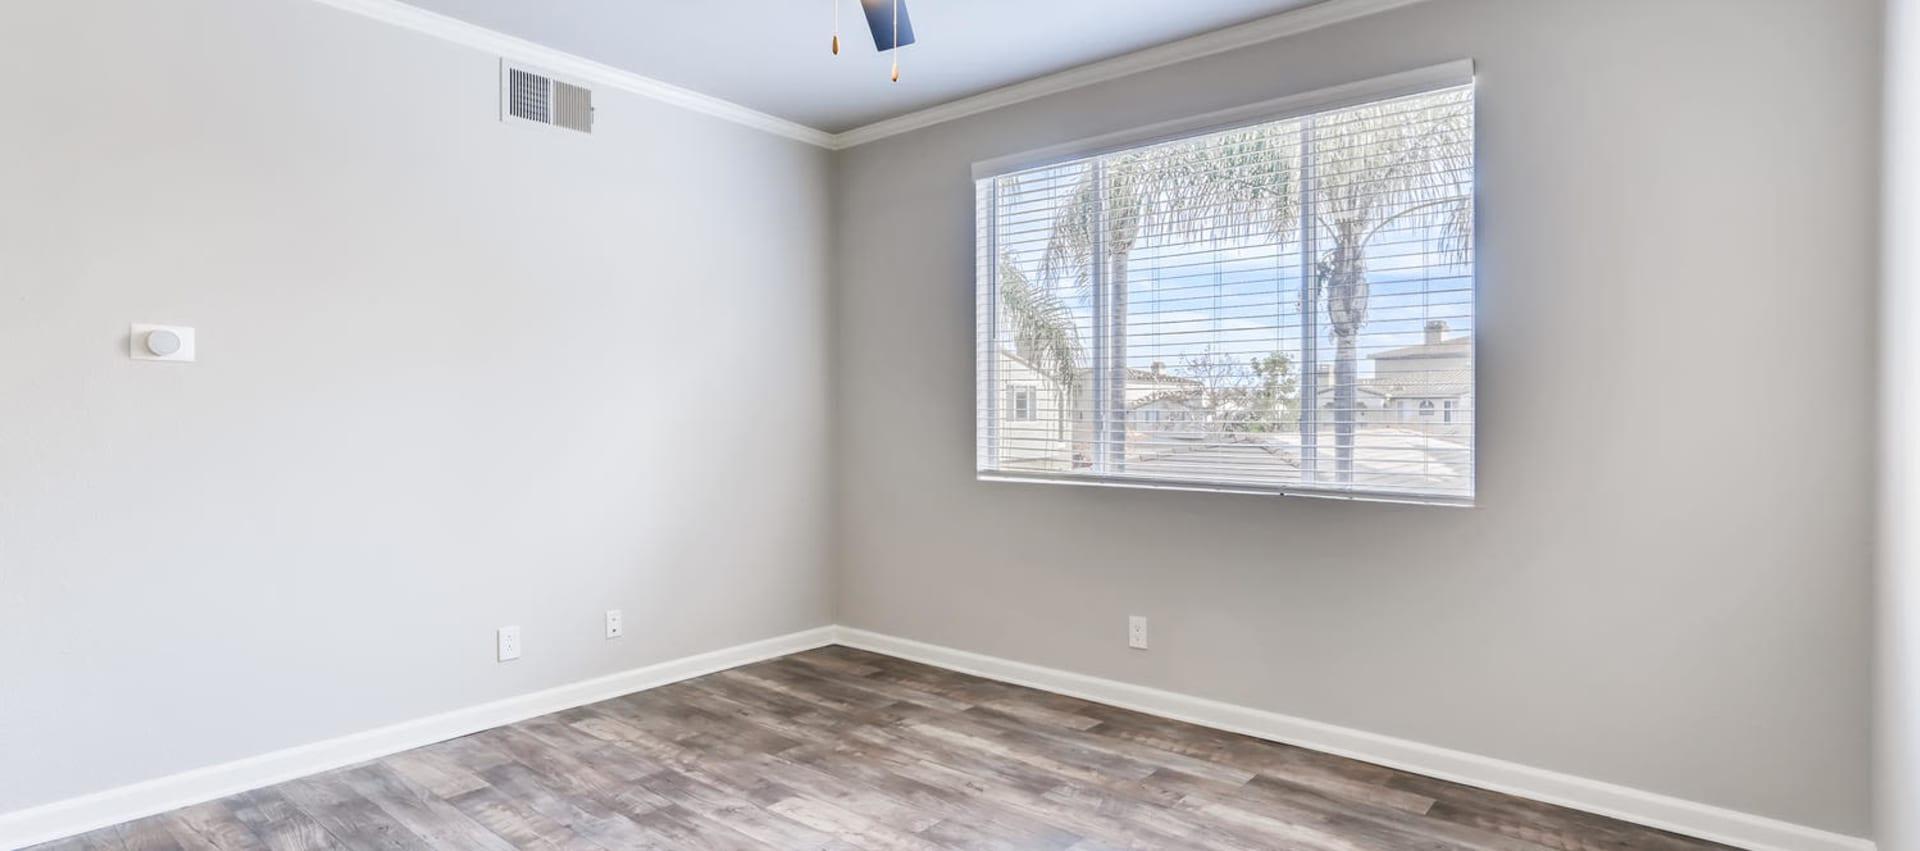 Bedroom at Alize at Aliso Viejo Apartment Homes in Aliso Viejo, California